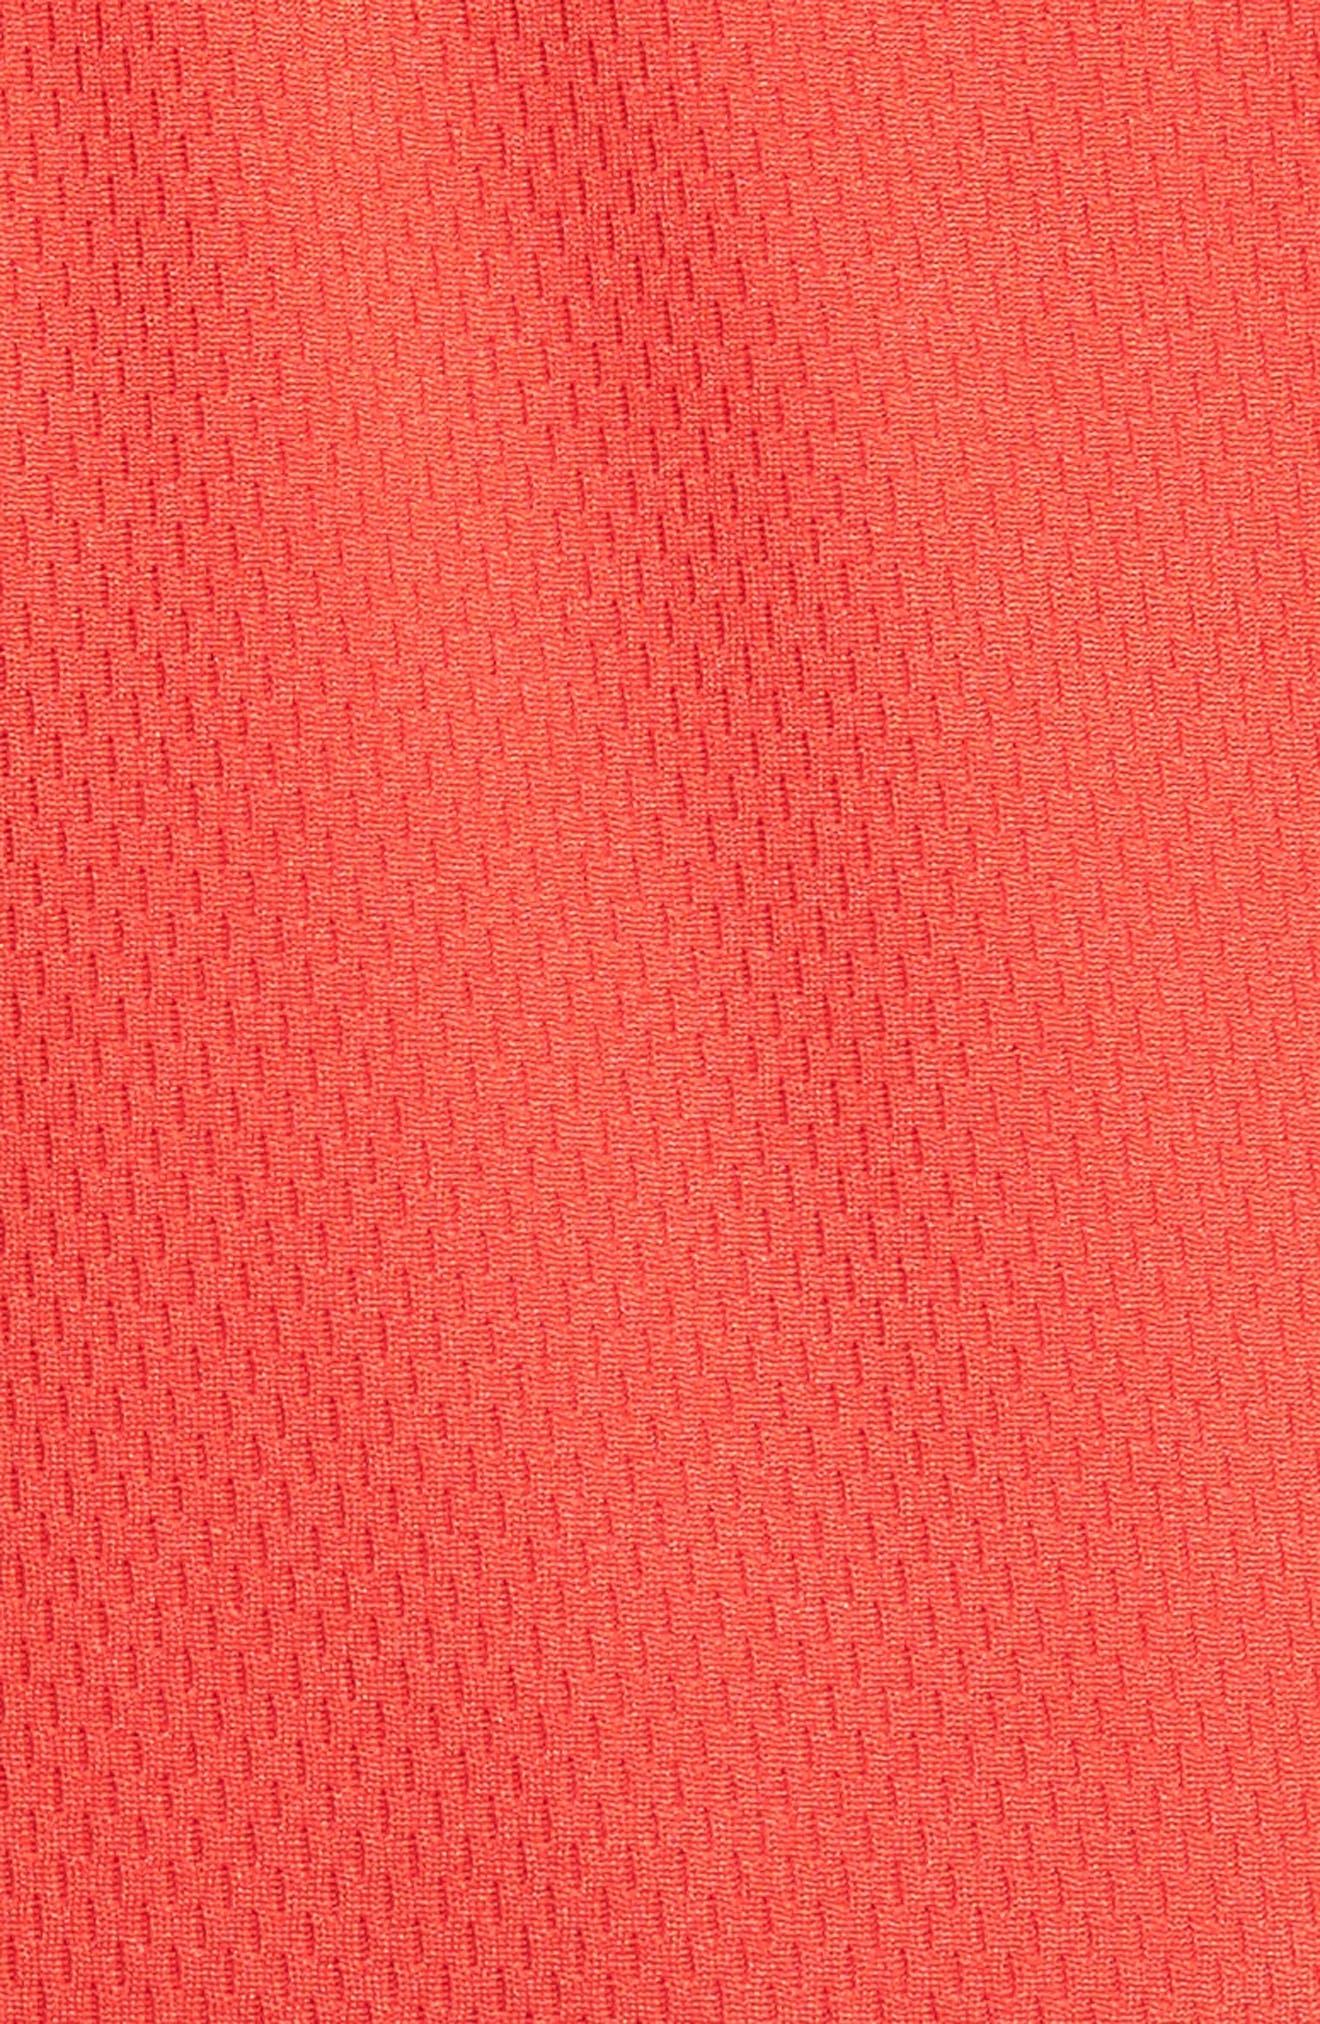 Elite Stripe Basketball Shorts,                             Alternate thumbnail 5, color,                             UNIVERSITY RED/ BLACK